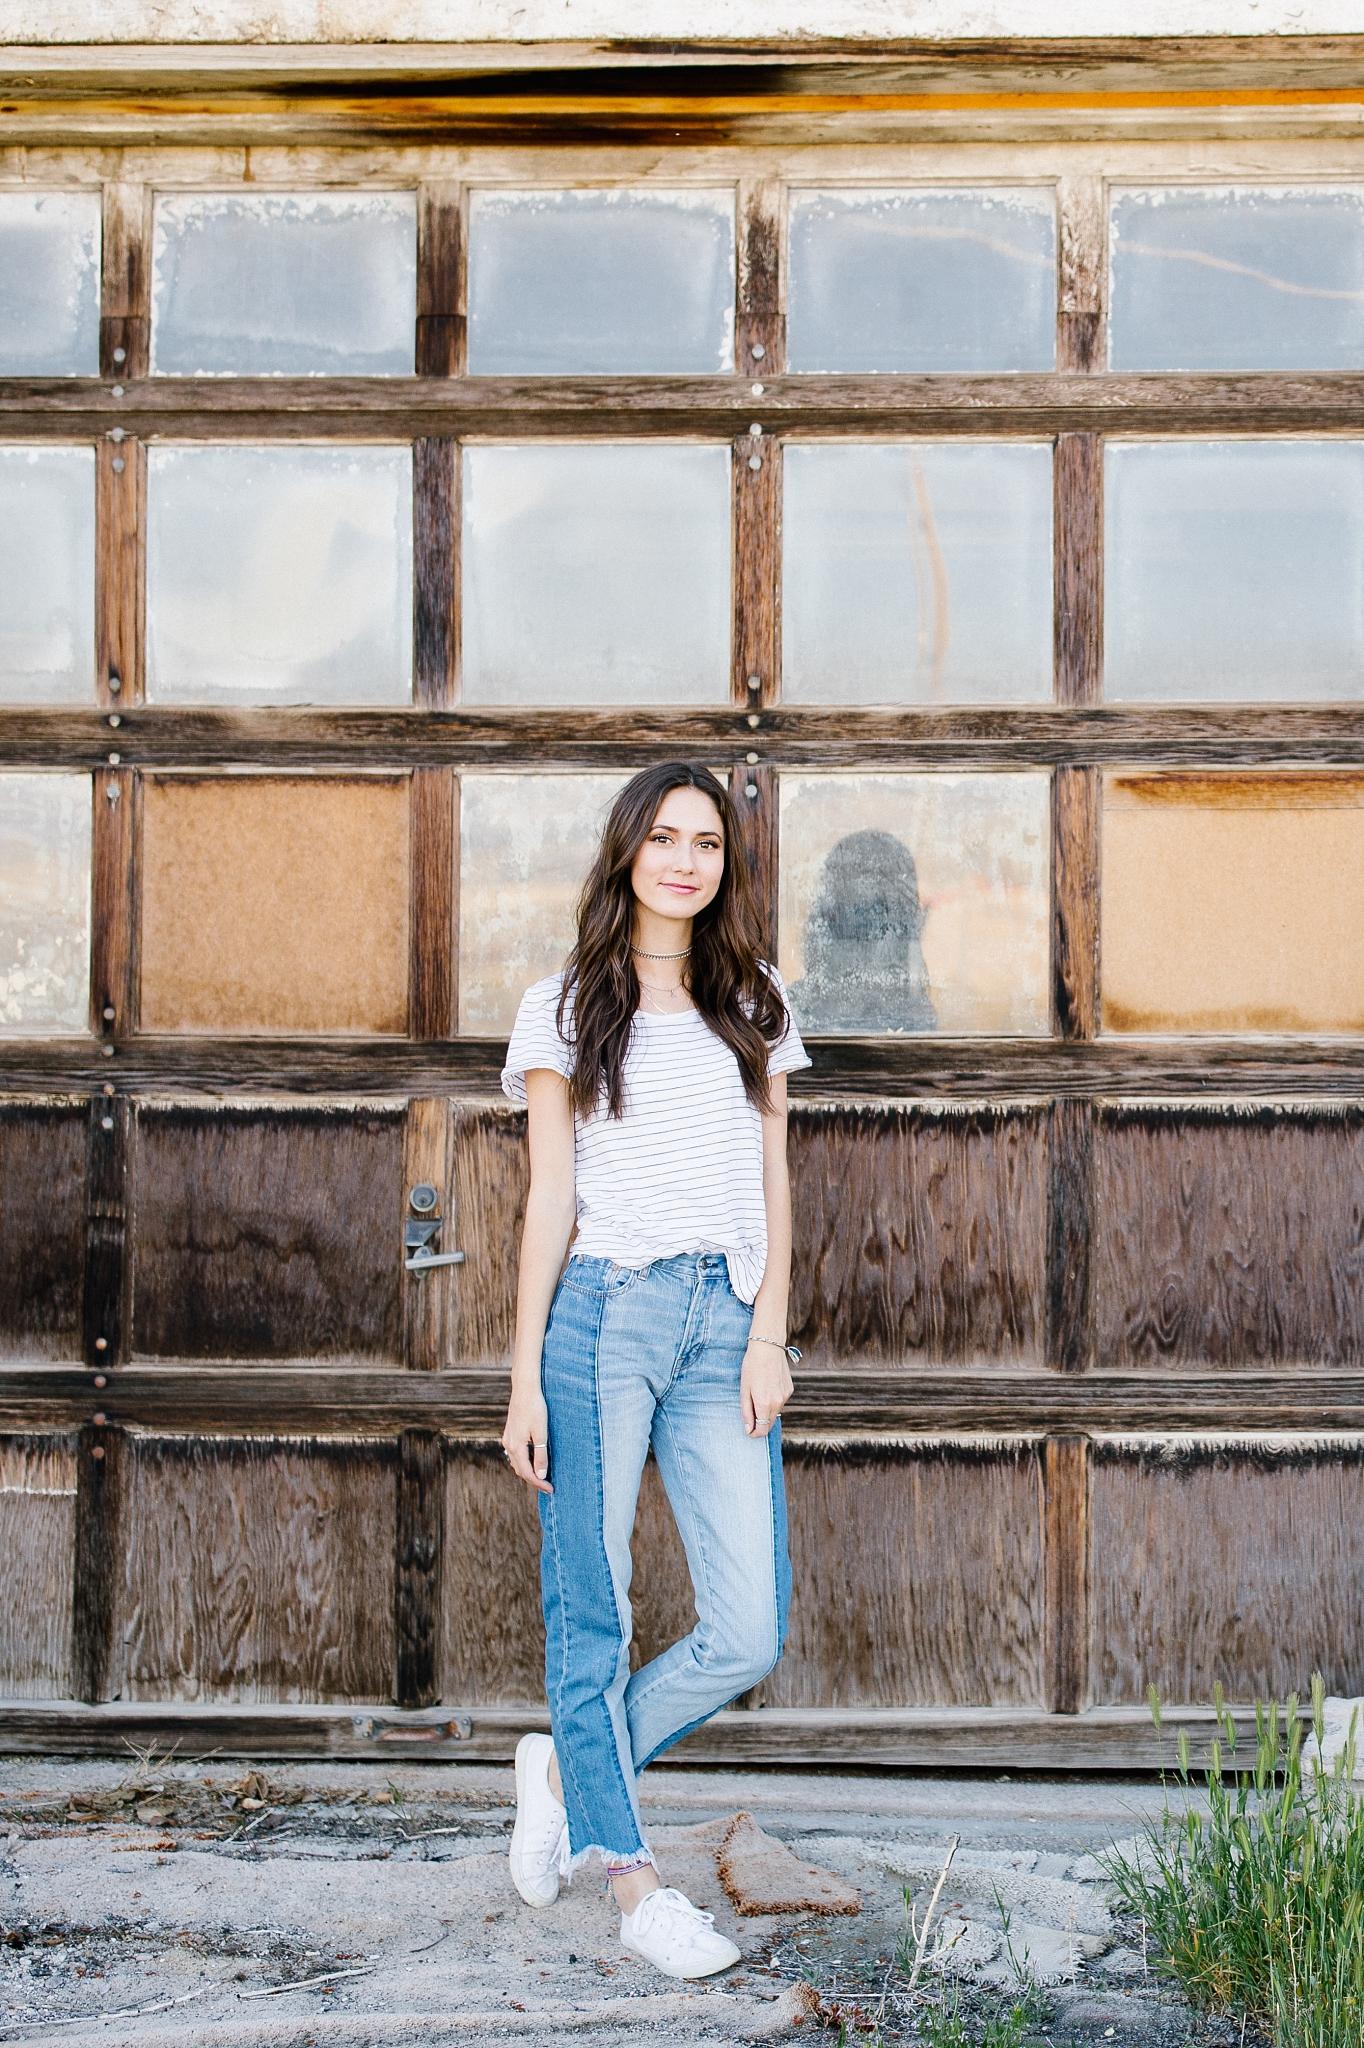 Audrey-27_Lizzie-B-Imagery-Utah-Family-Photographer-Central-Utah-Senior-Photography.jpg